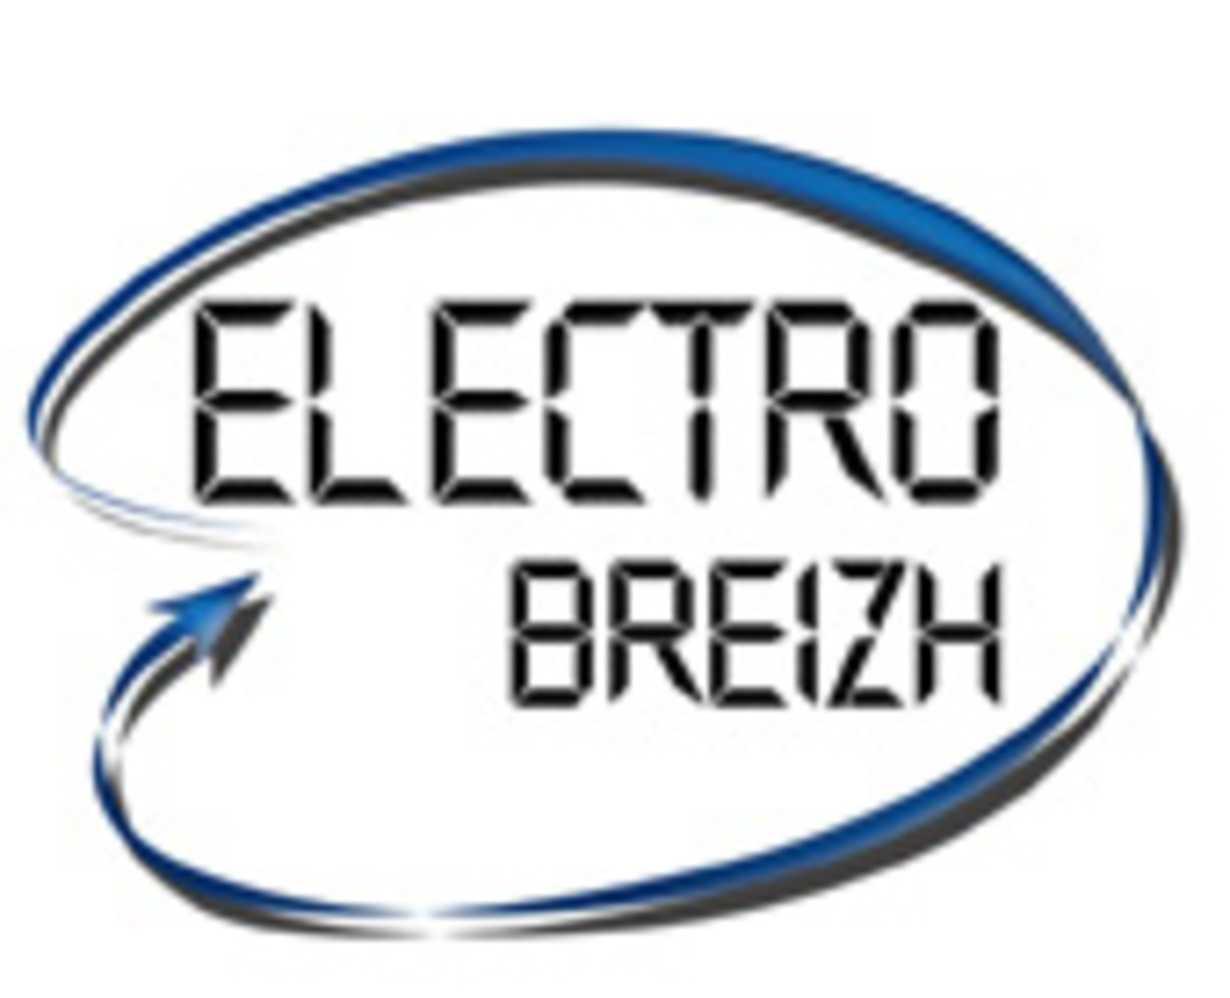 electro breizh